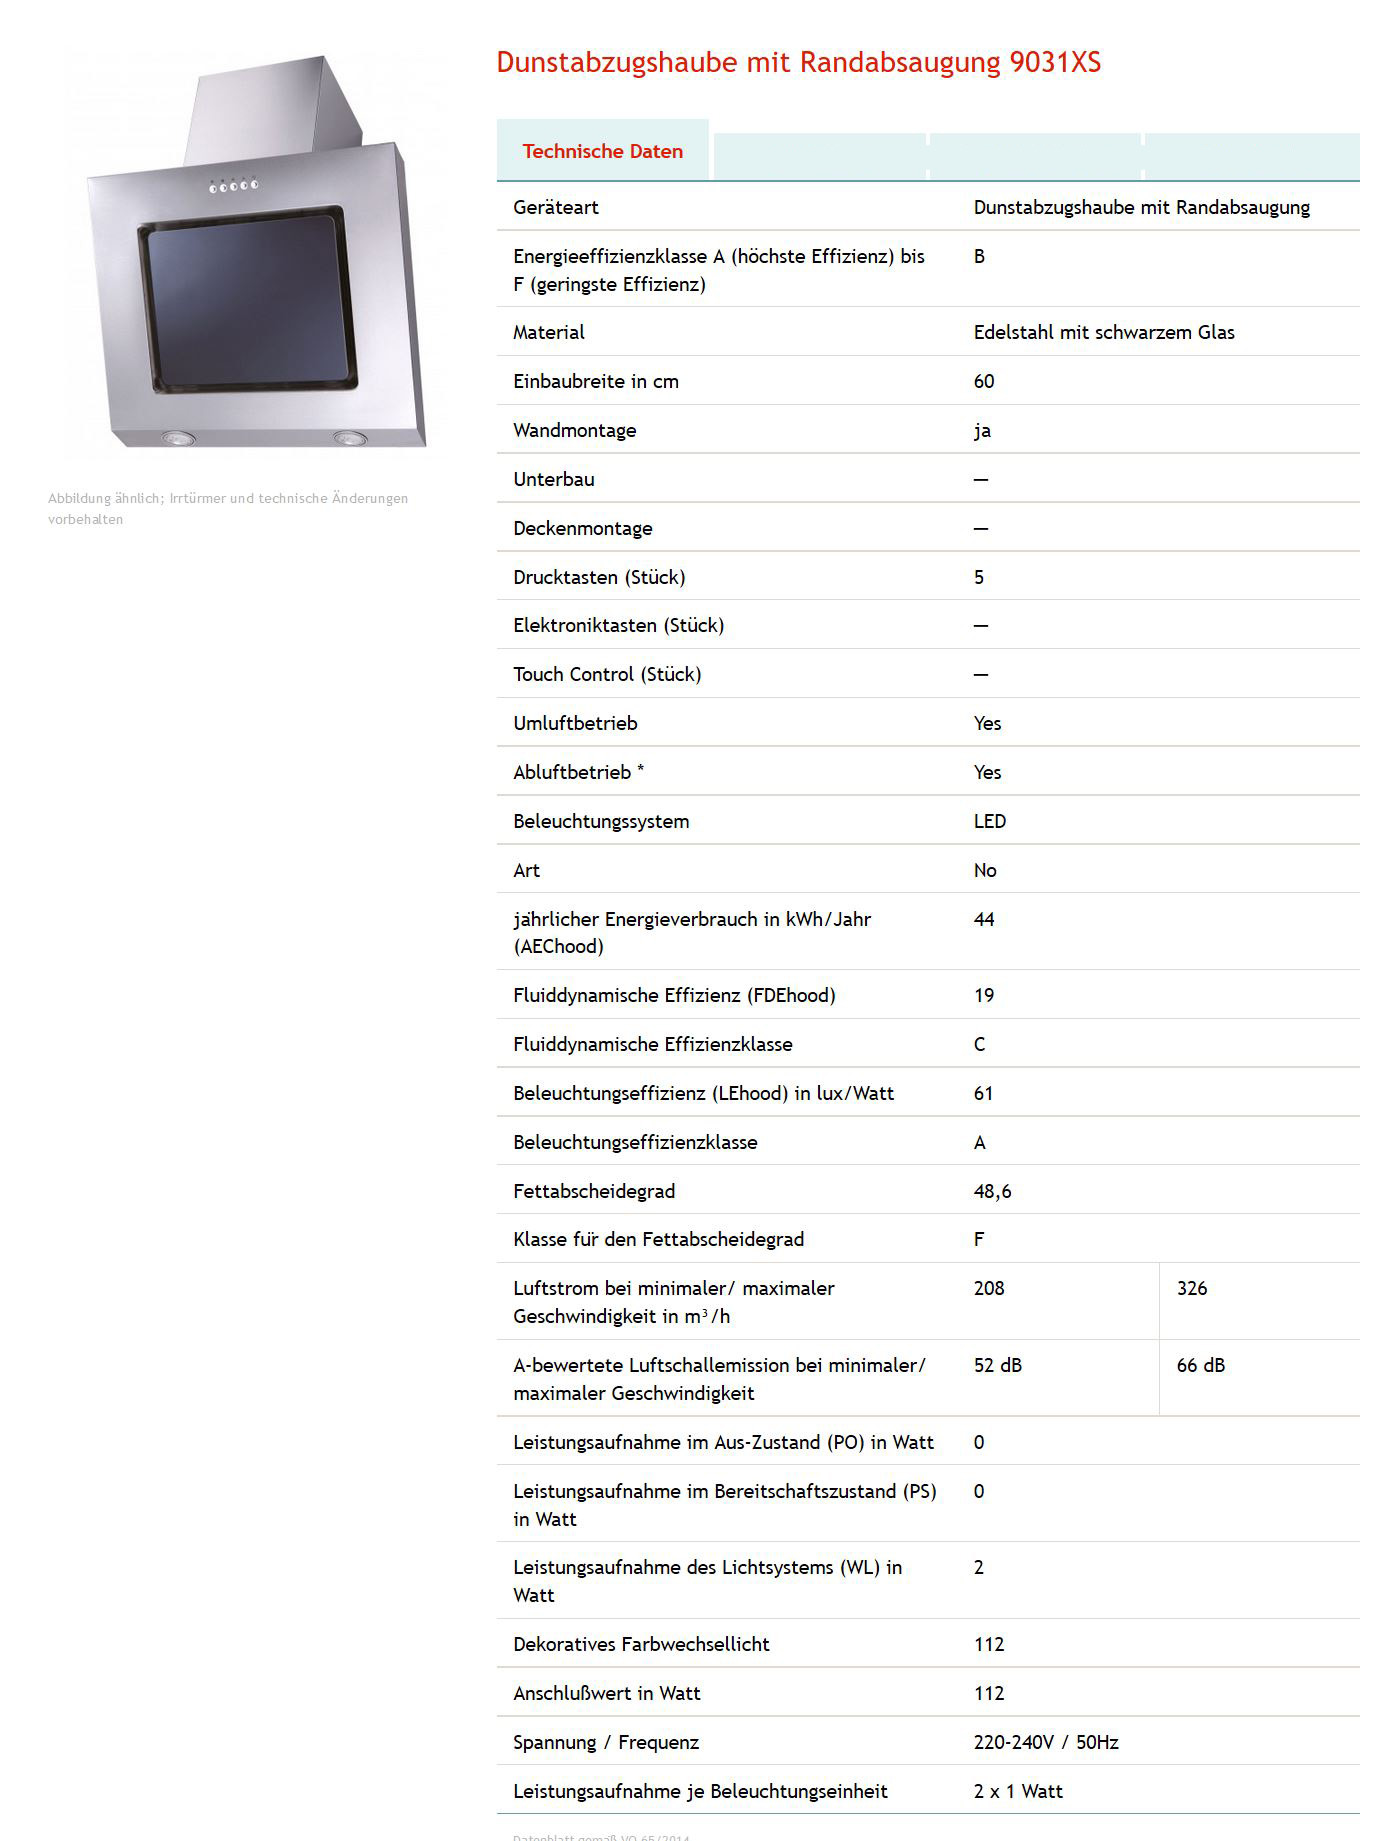 dunstabzugshaube mit randabsaugung turm abzugshaube flachschirm 60cm esse ee11 ebay. Black Bedroom Furniture Sets. Home Design Ideas